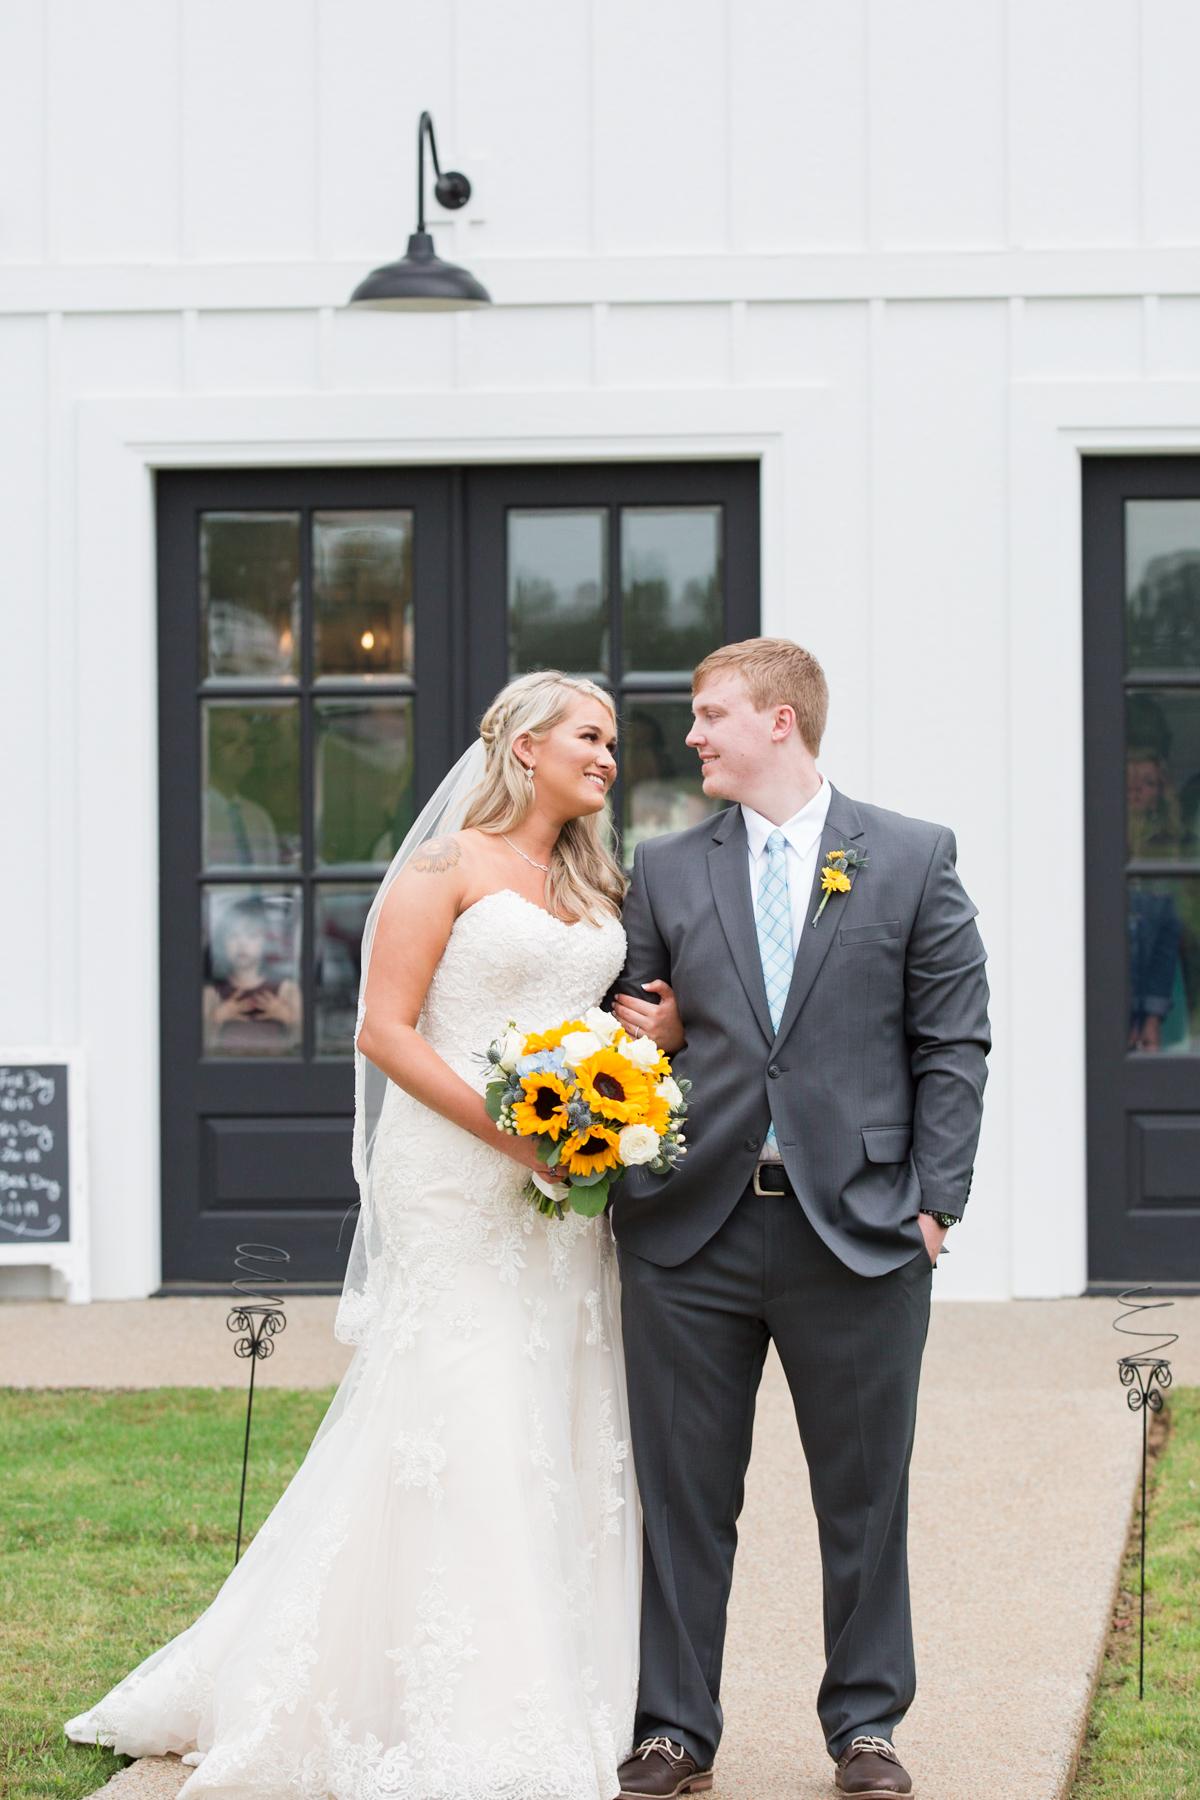 The-venue-at-white-oak-farms-wedding-nashville-wedding-photographers-0182.jpg